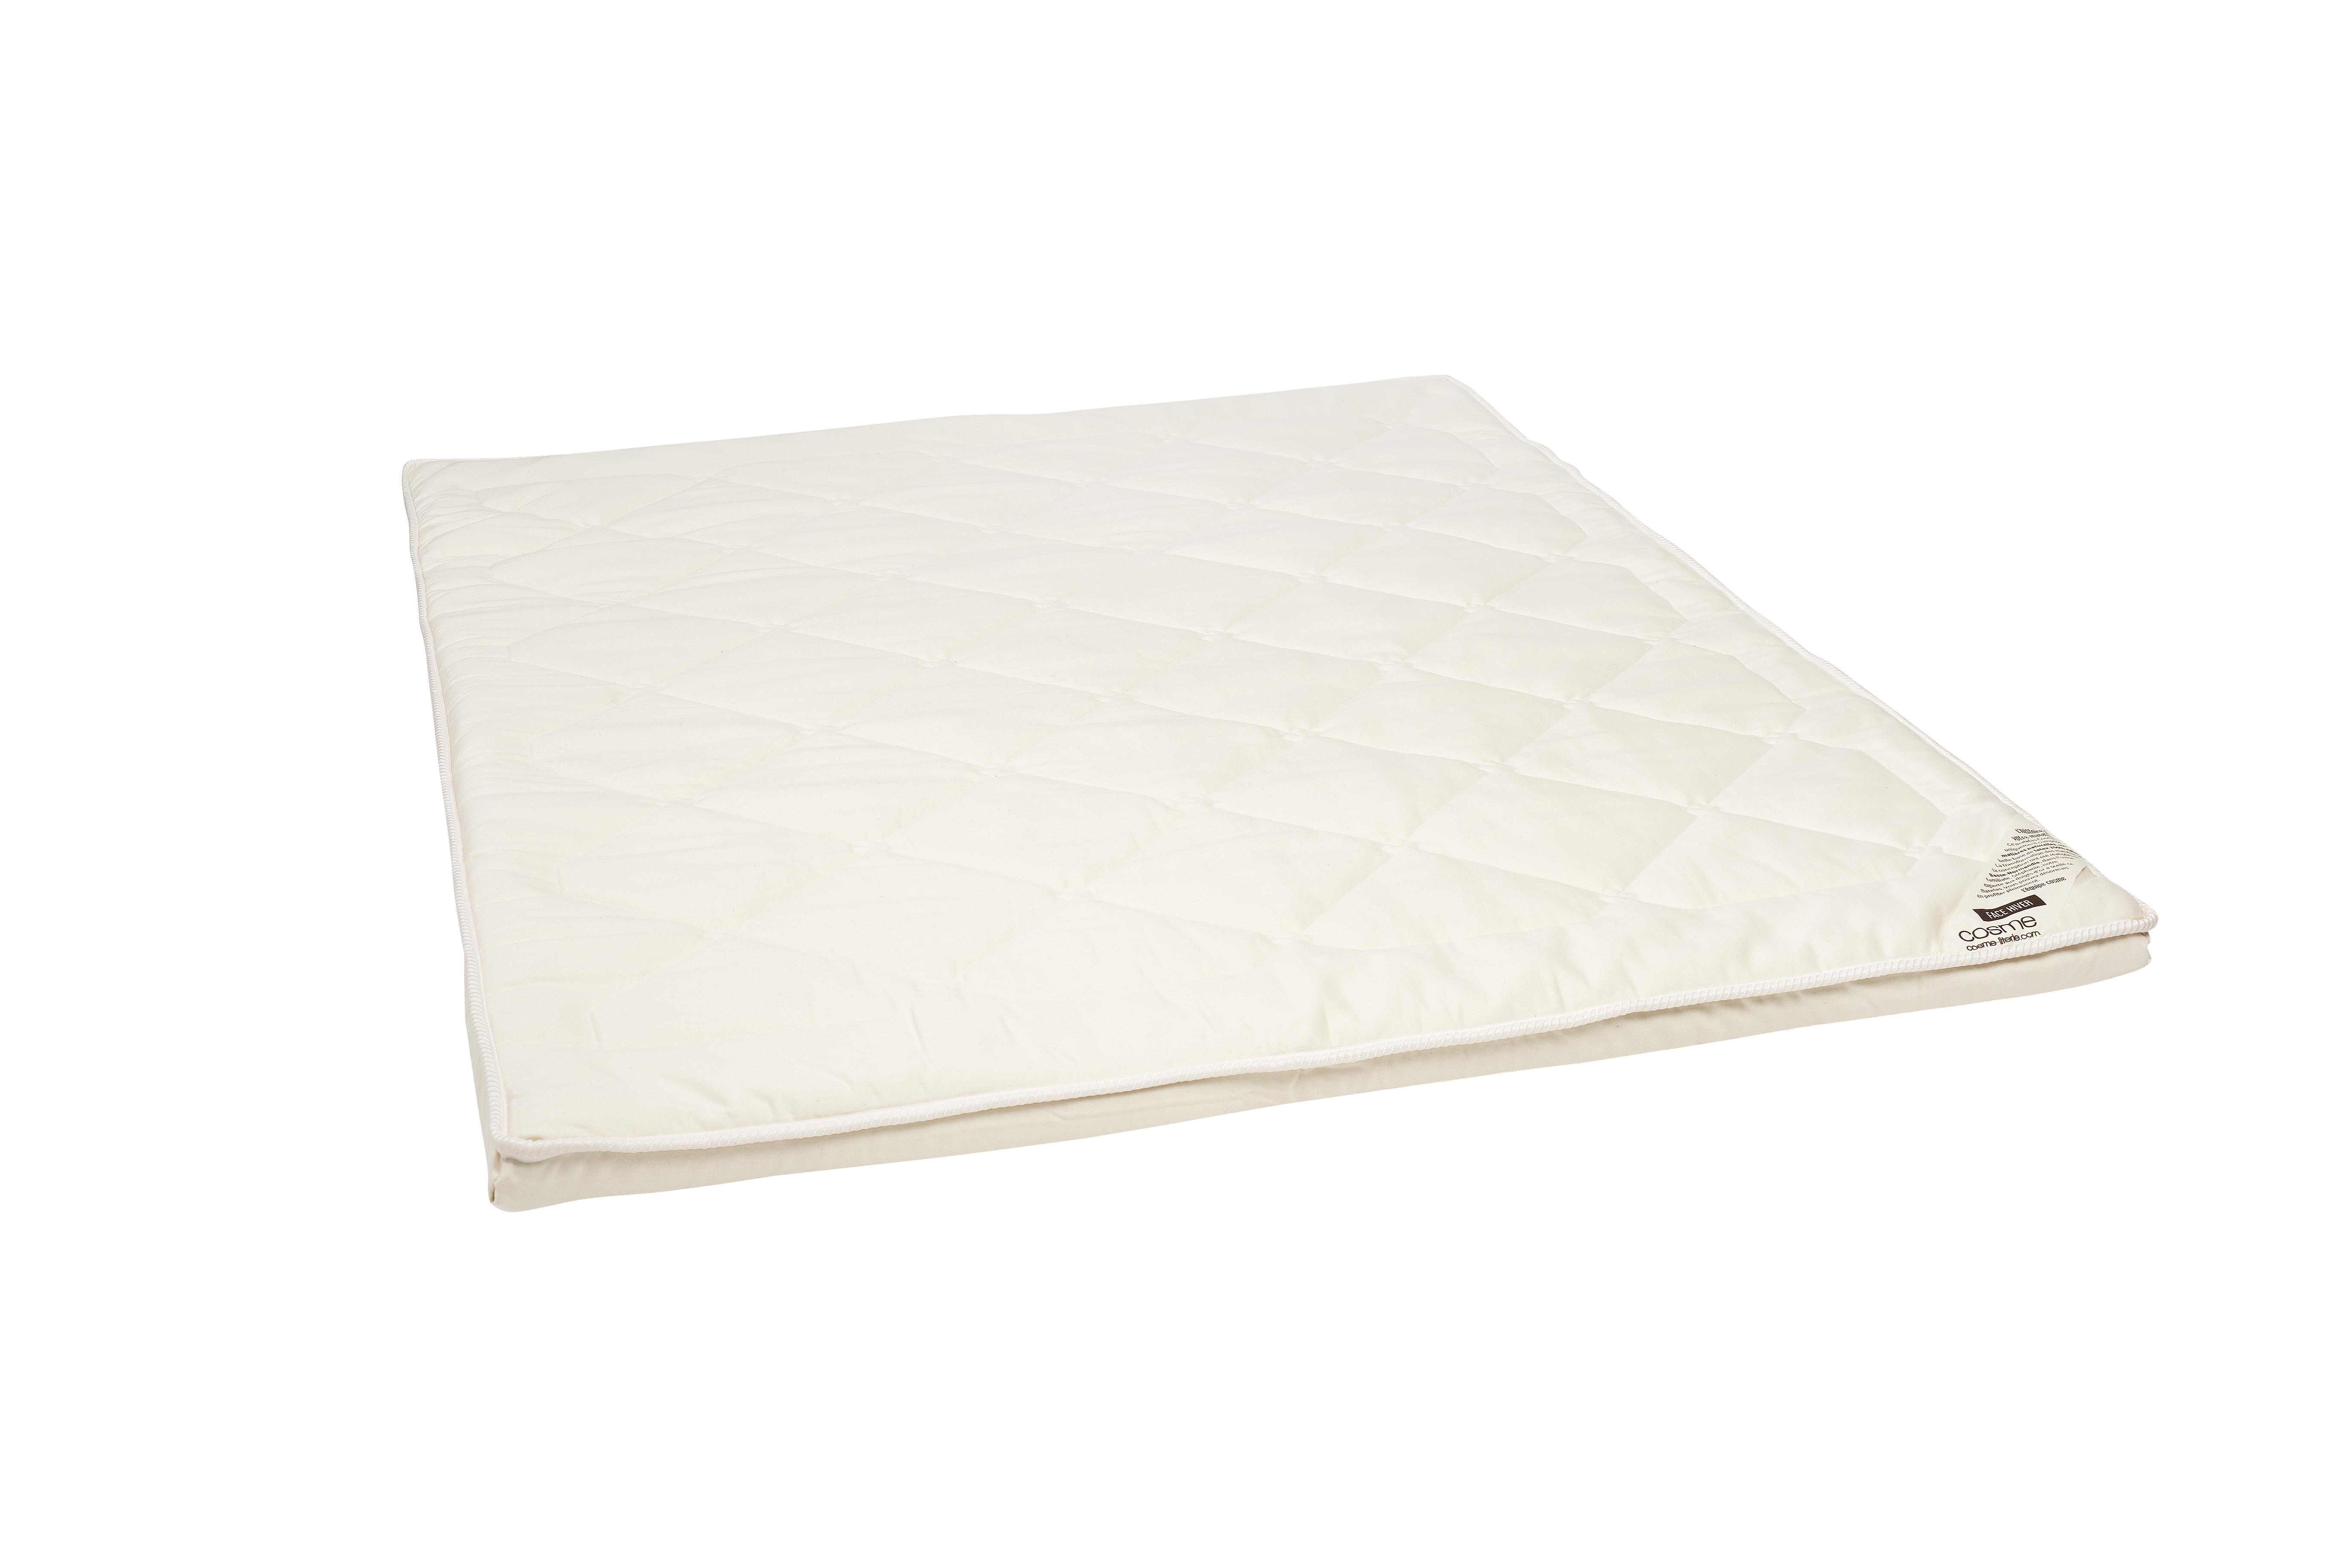 Surmatelas souple latex 100% naturel 180x200